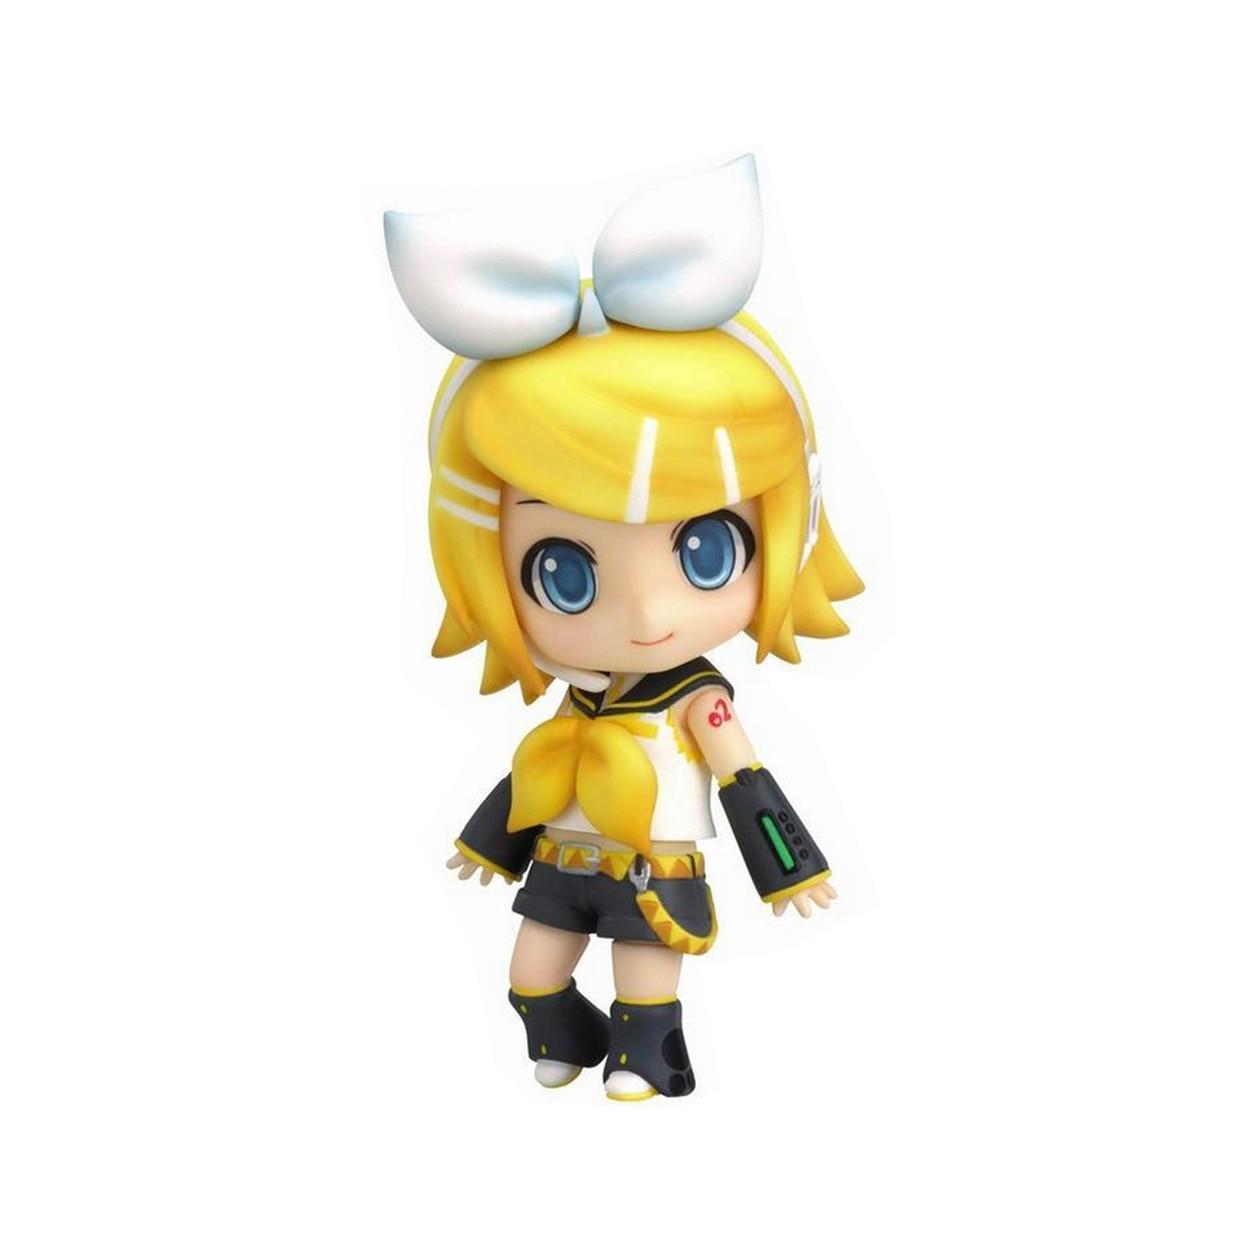 chanycore-gsc-nendoroid-189-font-b-vocaloid-b-font-hatsune-miku-kagamine-rin-miku-sakura-miku-pvc-action-figure-collection-model-toy-10cm-4''